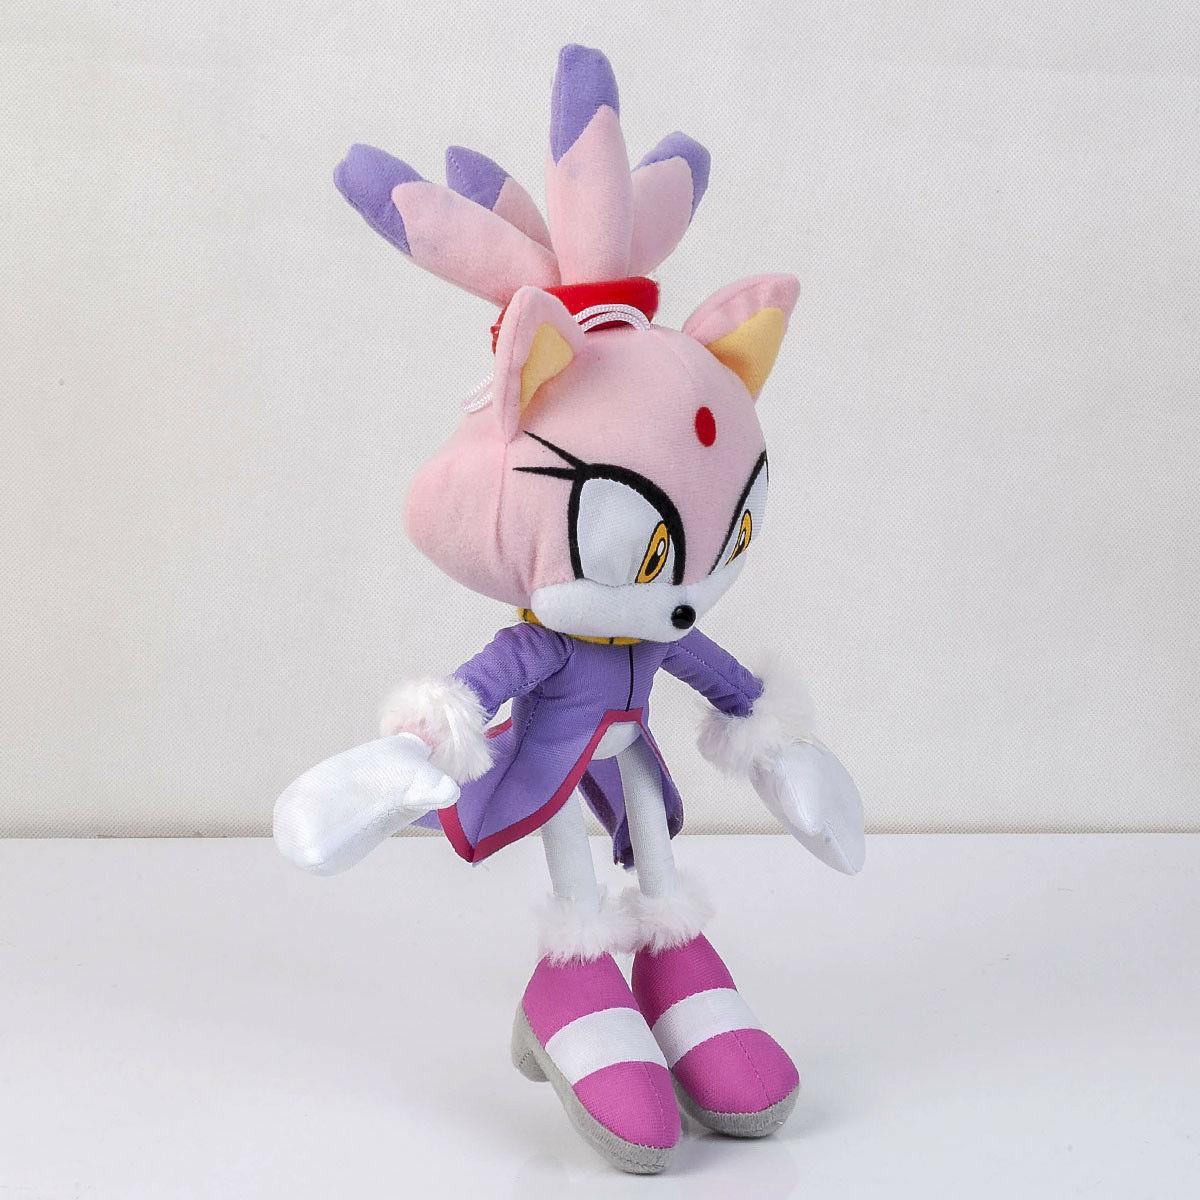 Sonic The Blaze the Cat Plush Toy Stuffed Anime Doll